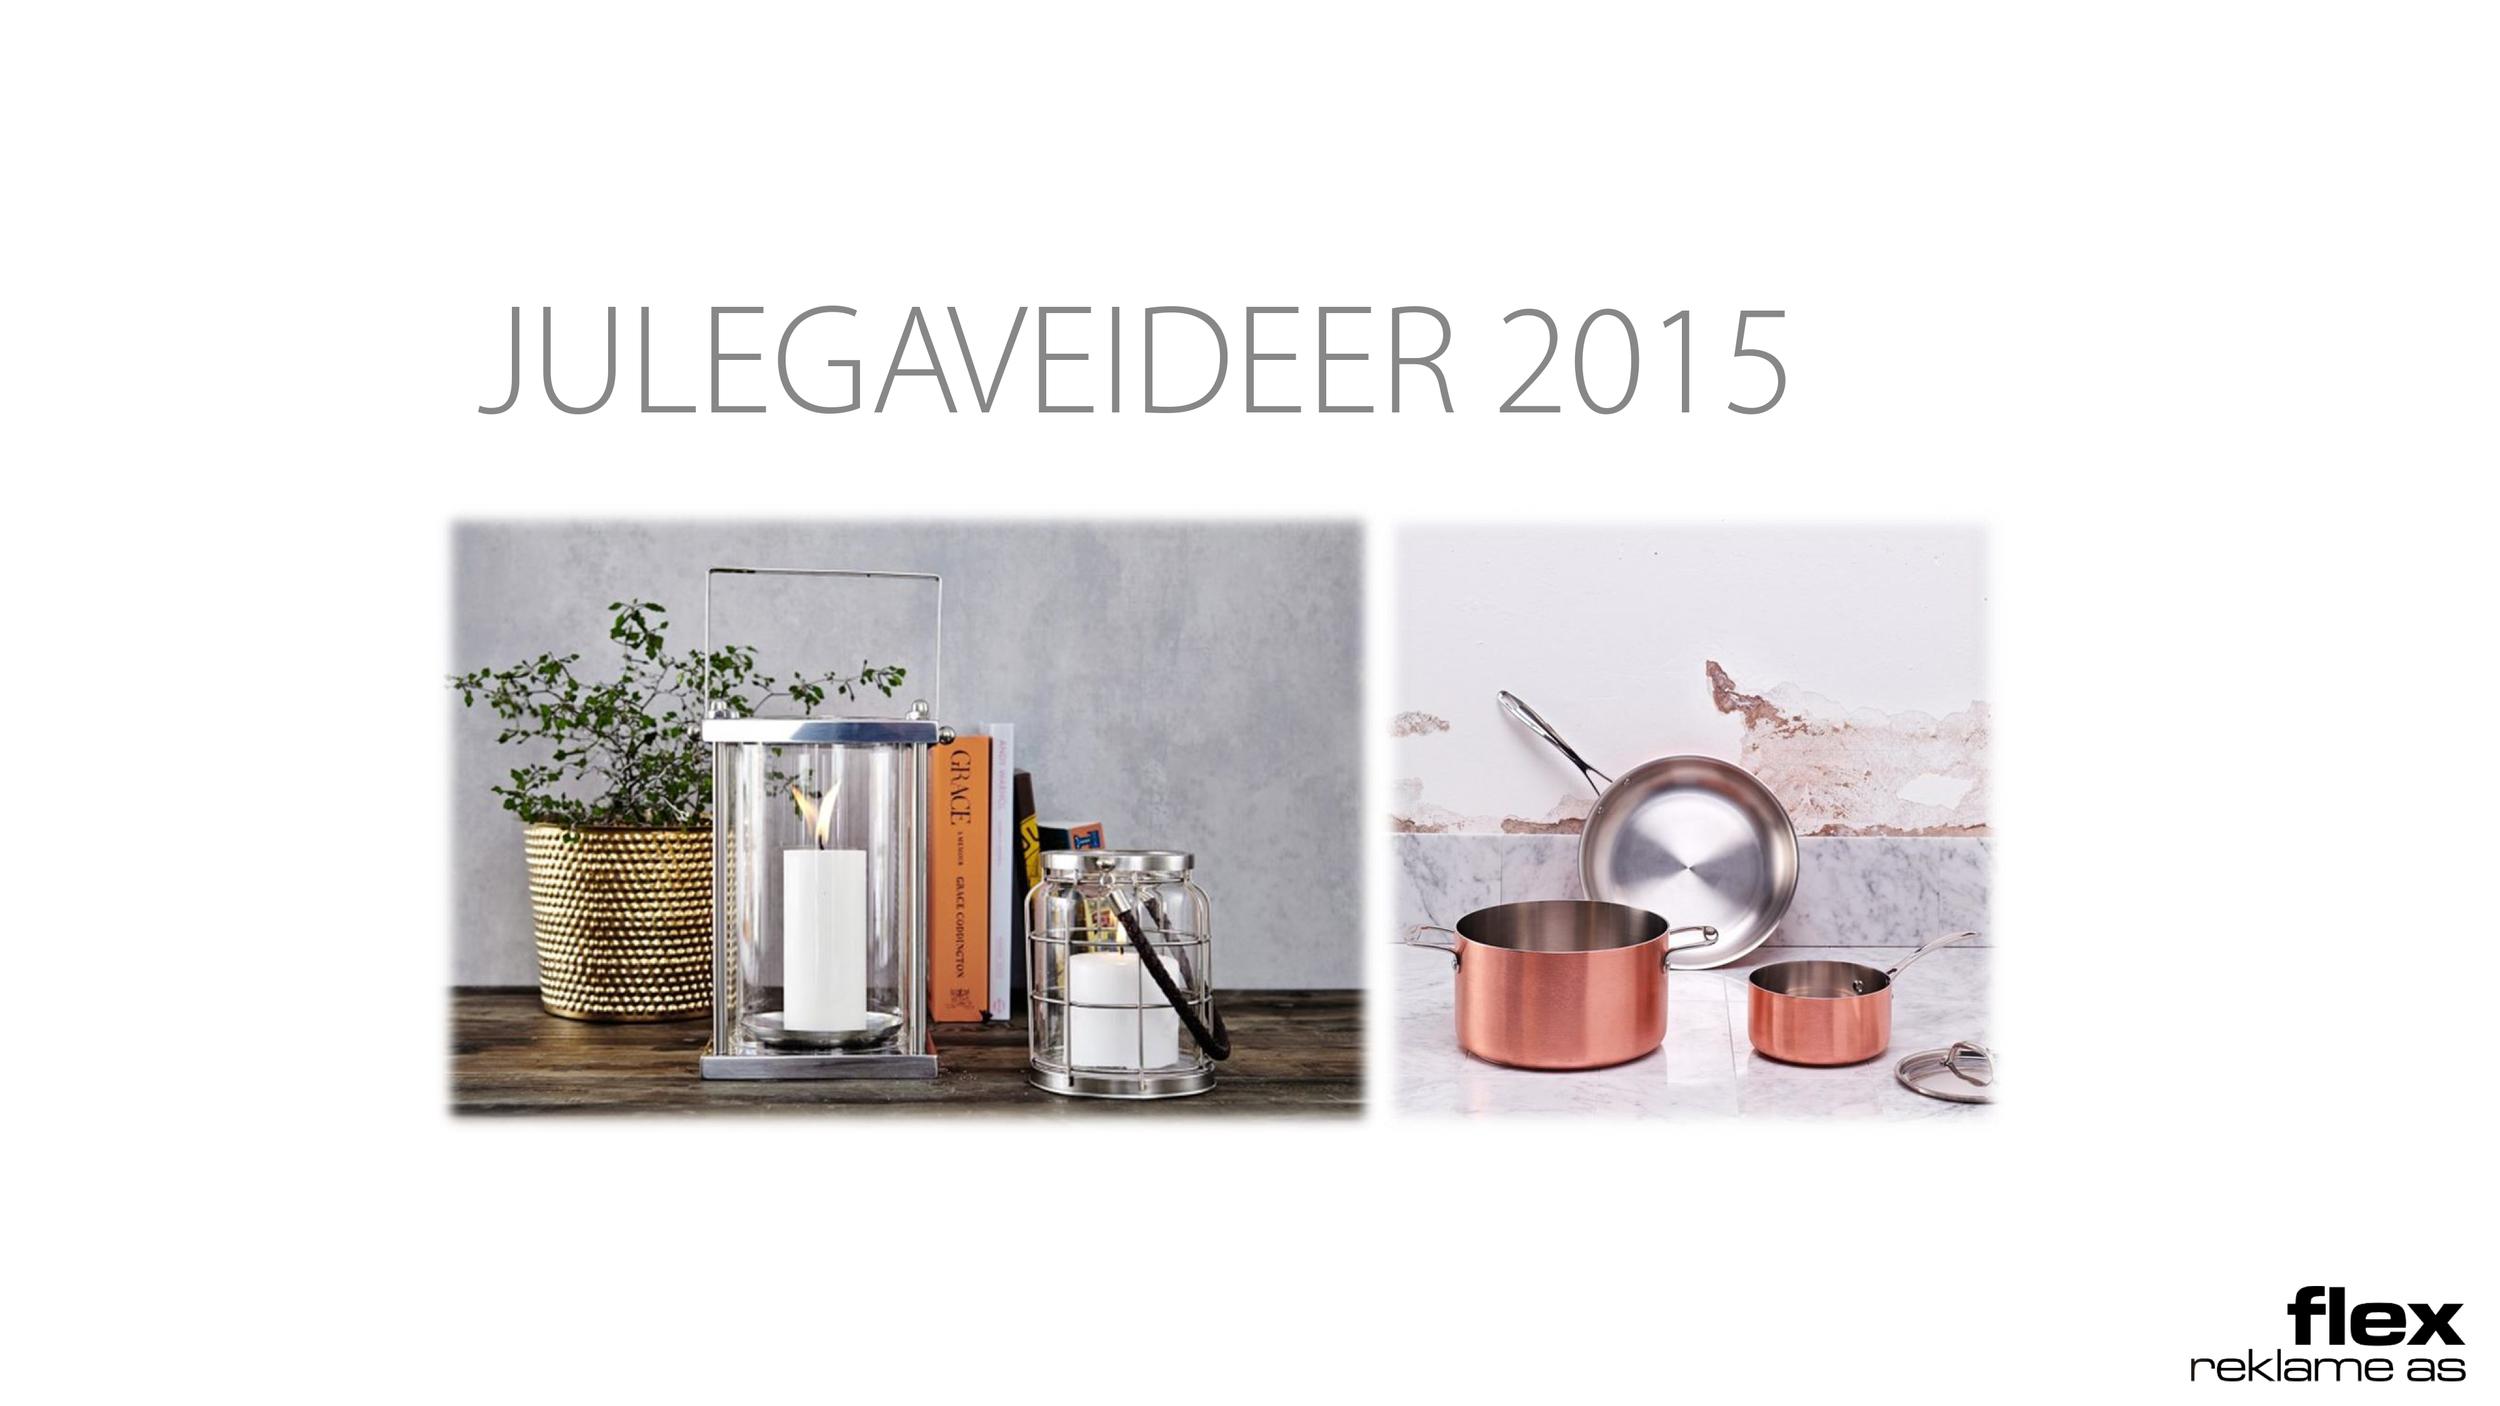 Flex Jule katalog 2015_final_24.09.15-1.jpg